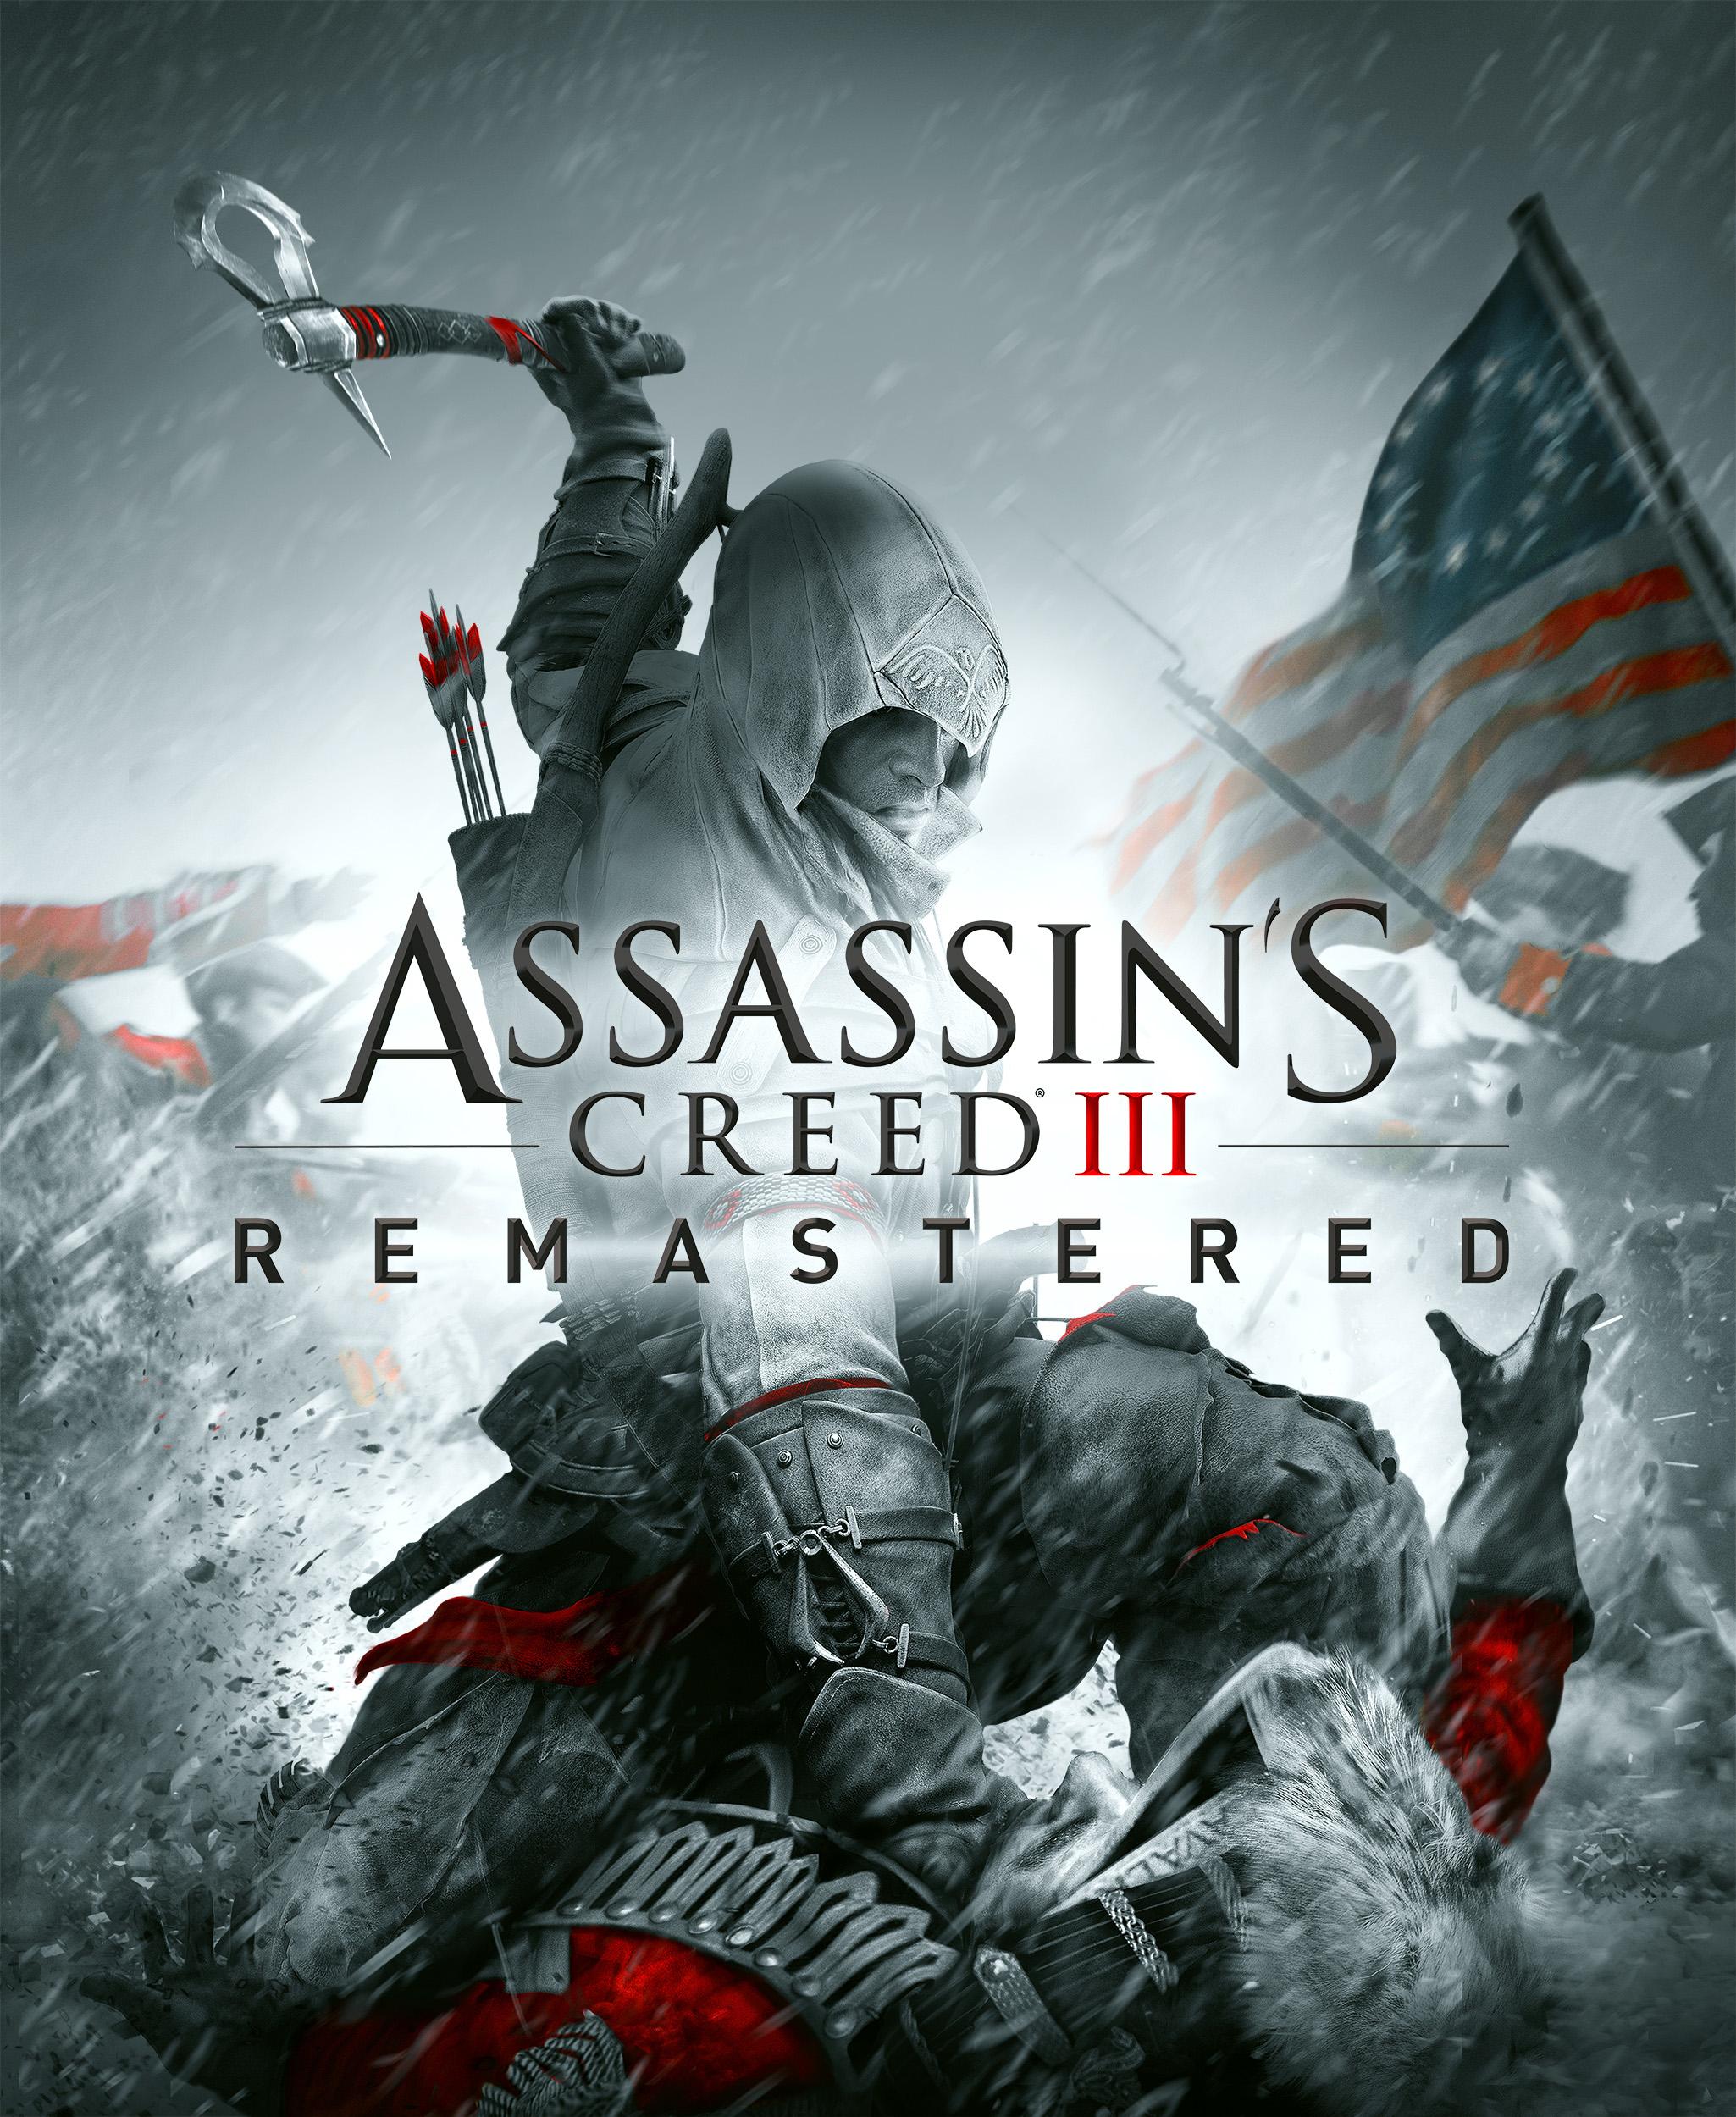 Assassins-Creed-III-Remastered-Key-Visua